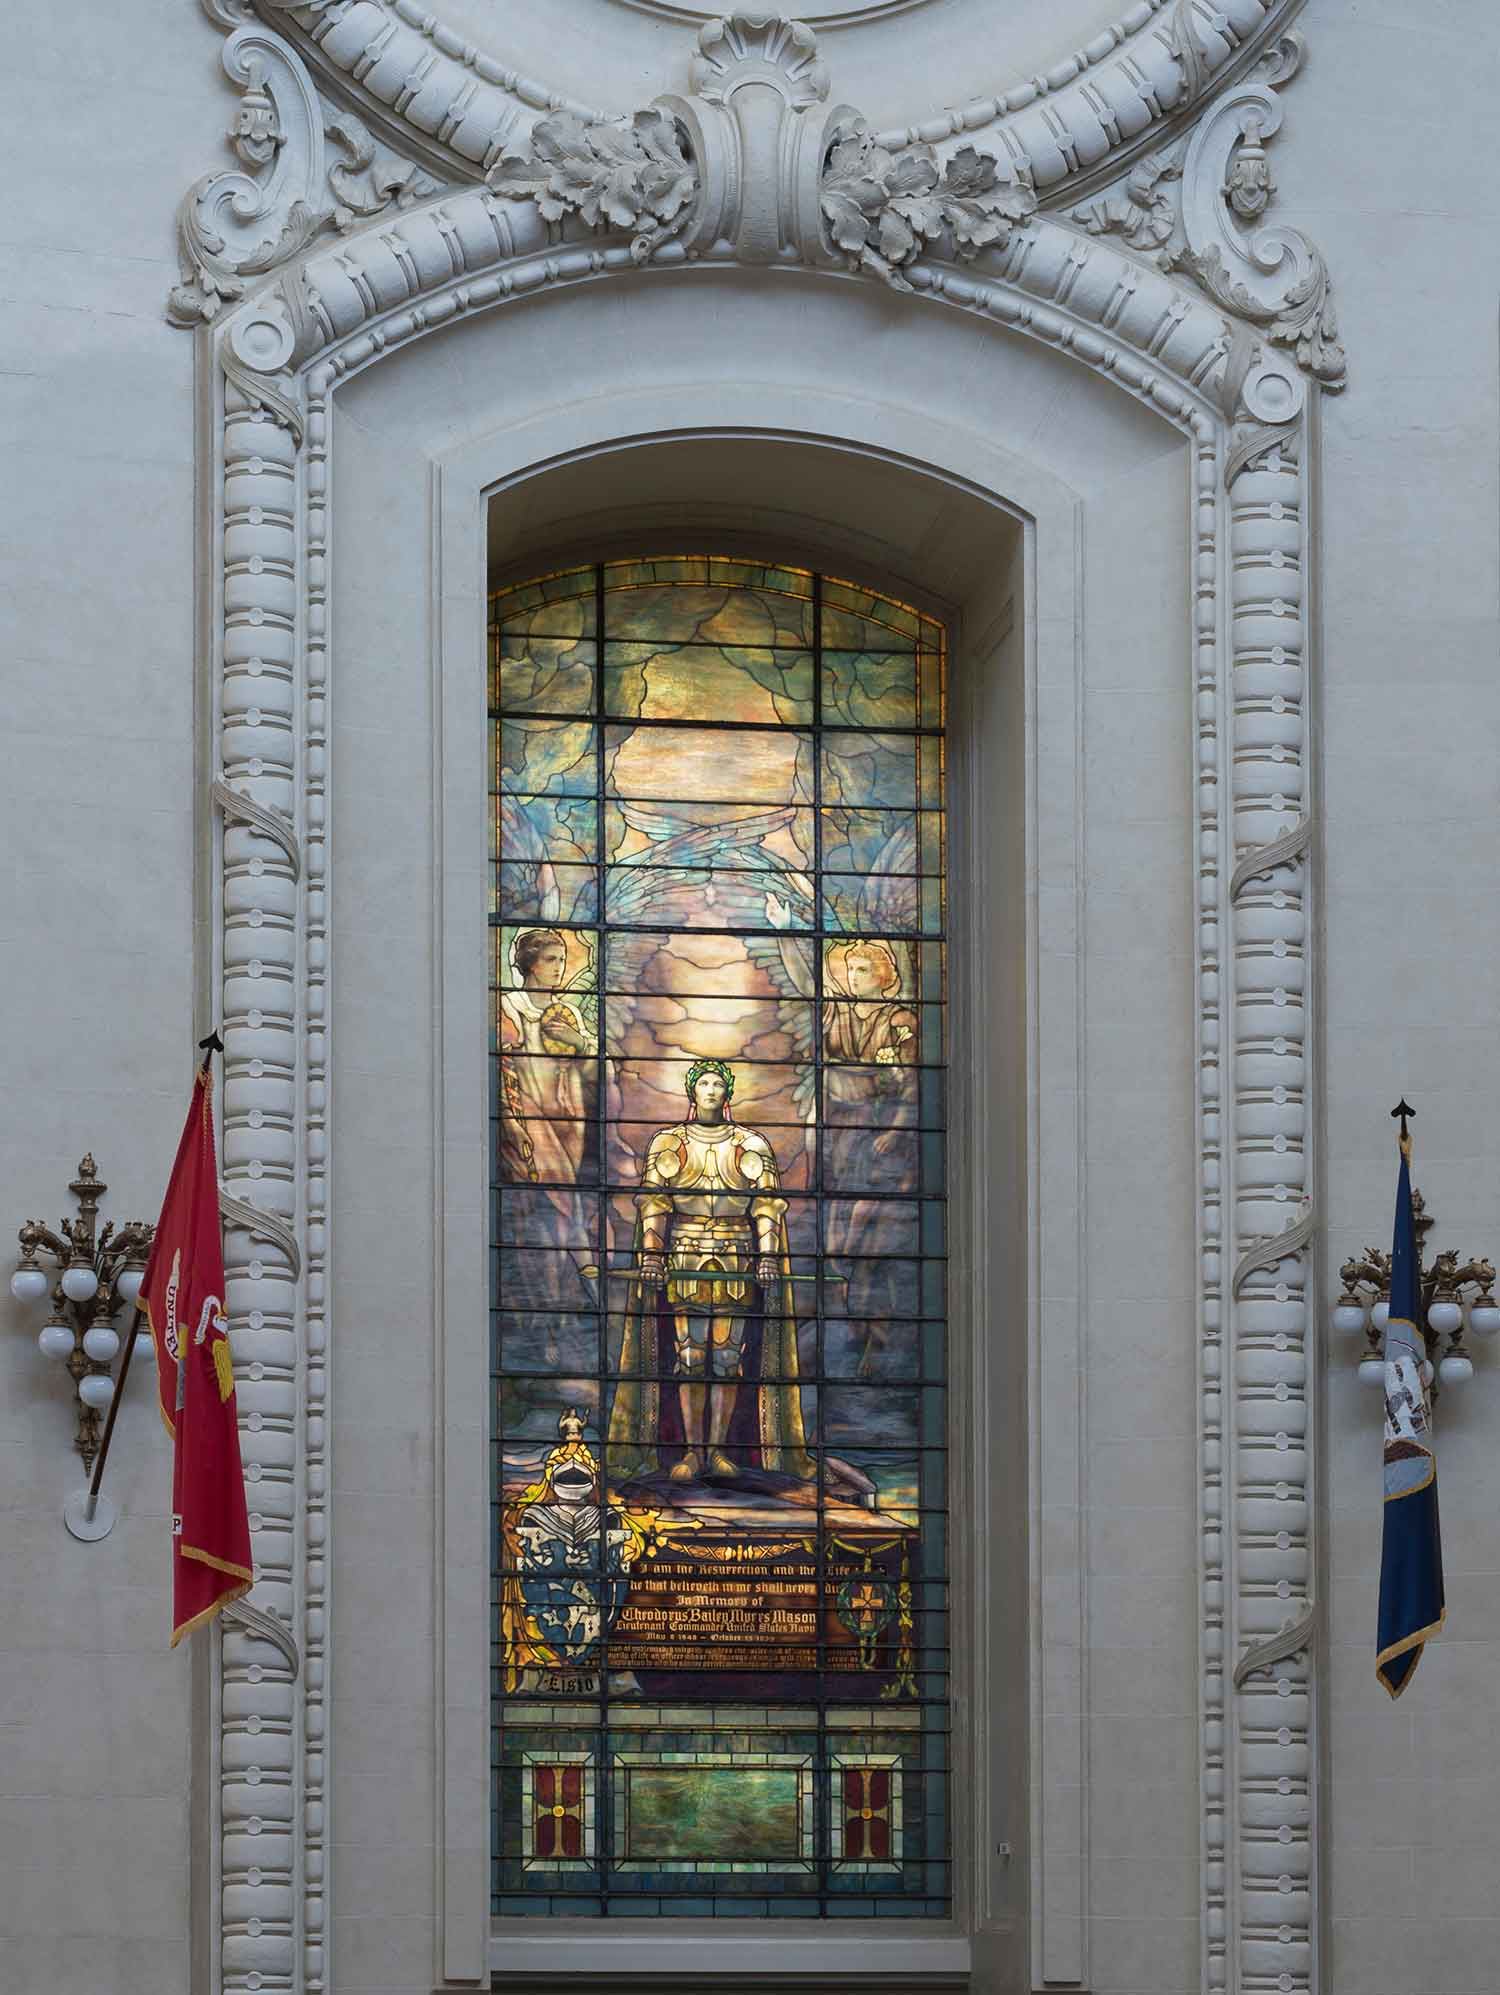 Tiffany,-BEFORE-Sir-Galahad-Window,-USNA,-5188,-C1